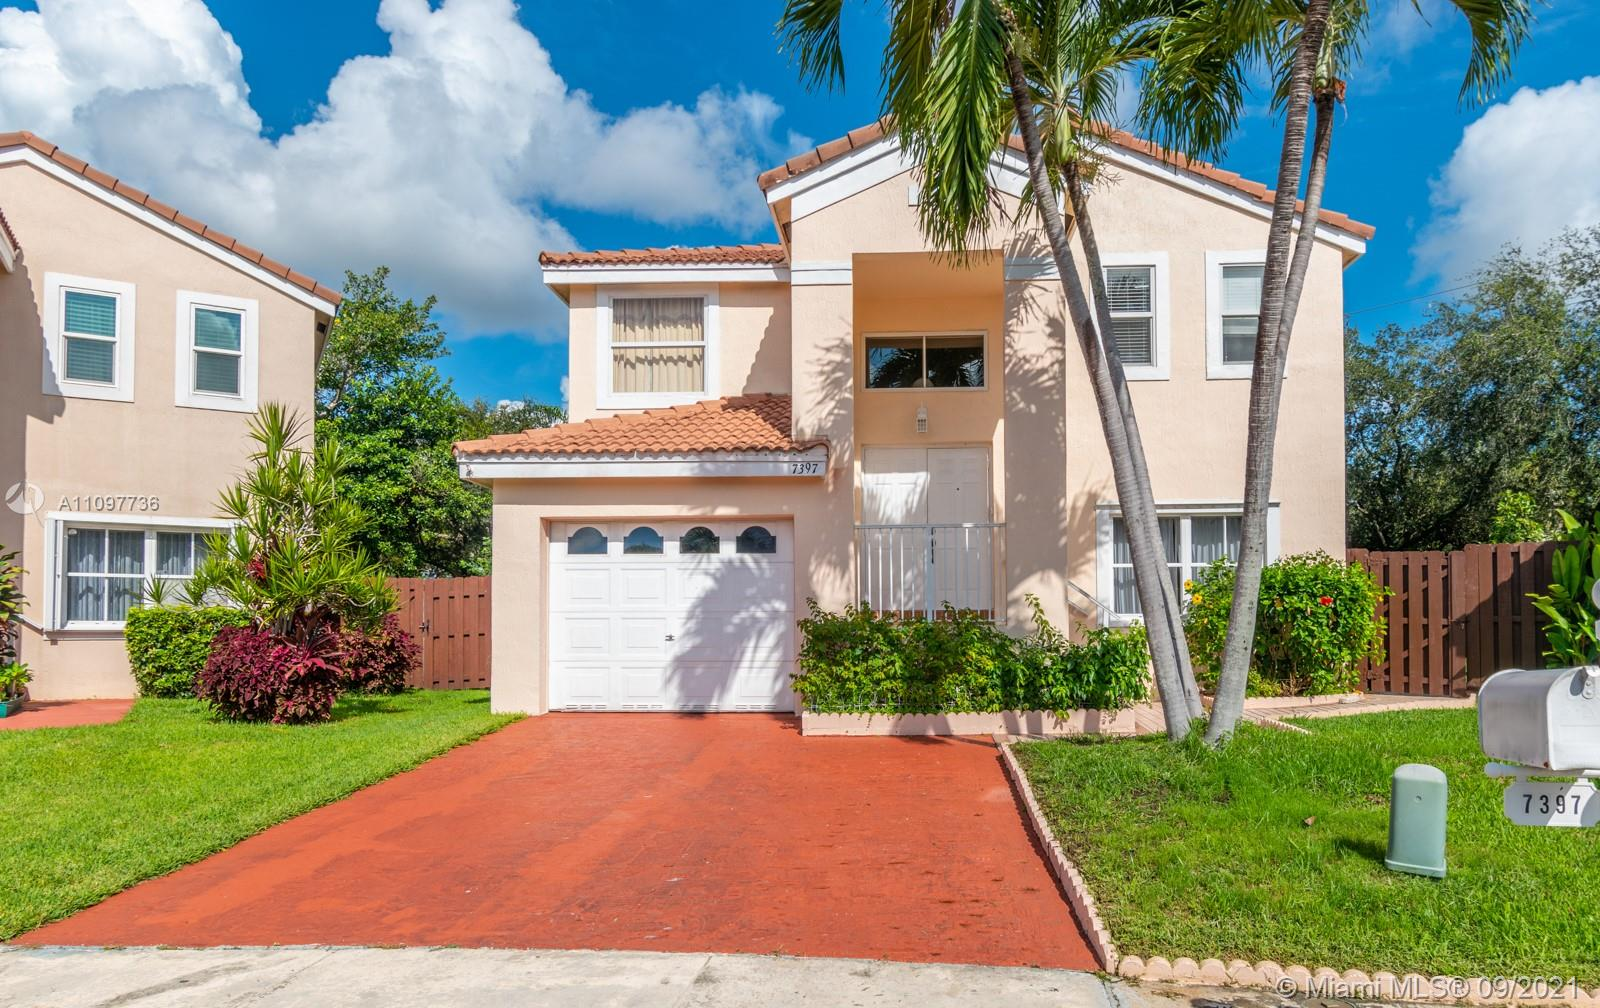 7397 Flores Way, Margate, Florida 33063